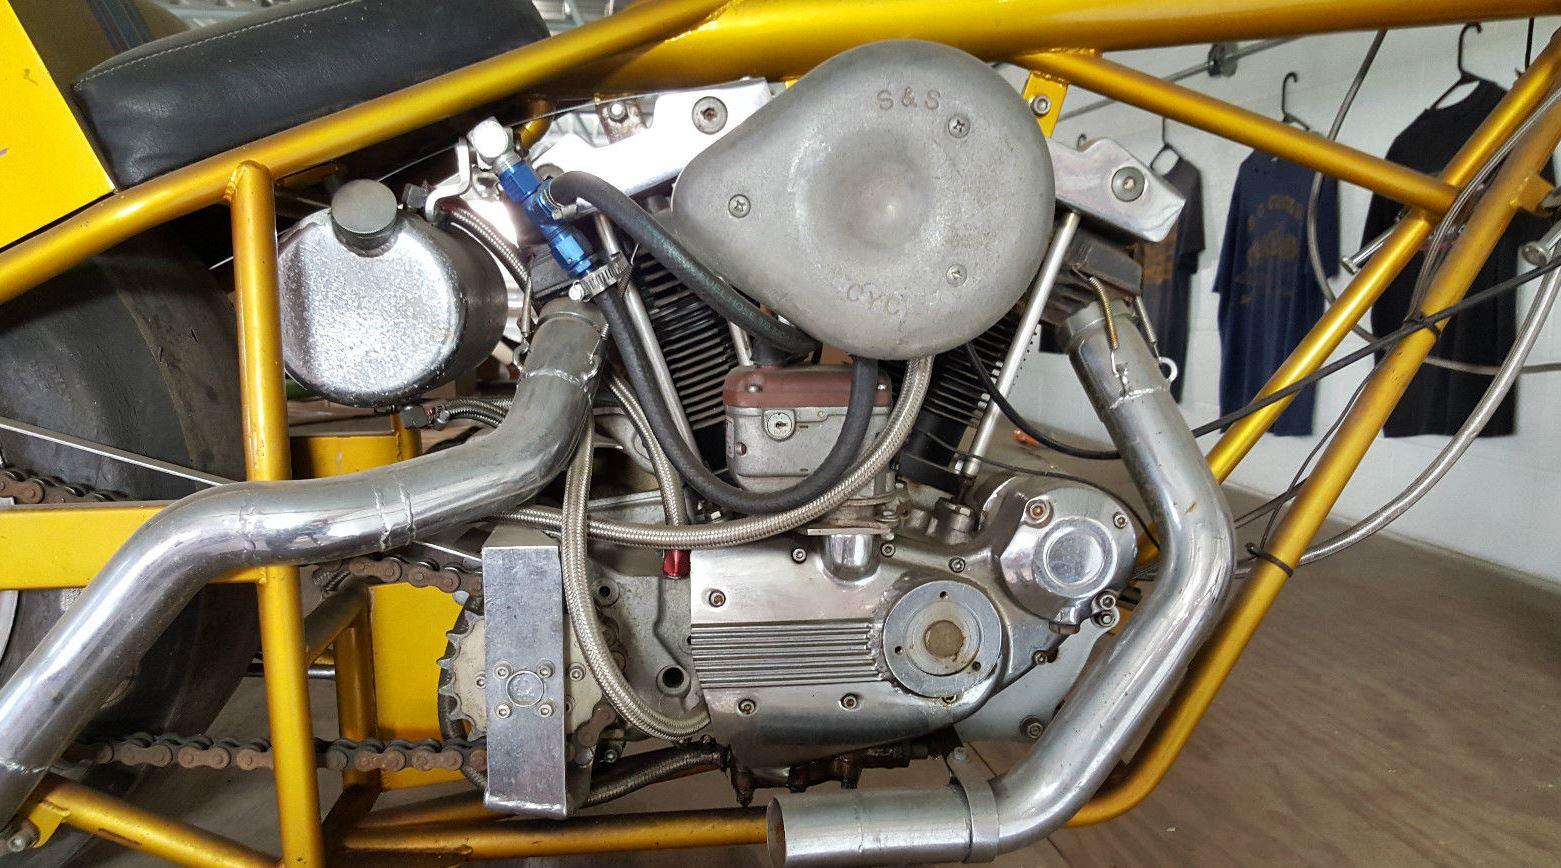 Kosman racing products - Classic Dragster 1979 Kosman Sportster Bike Urious